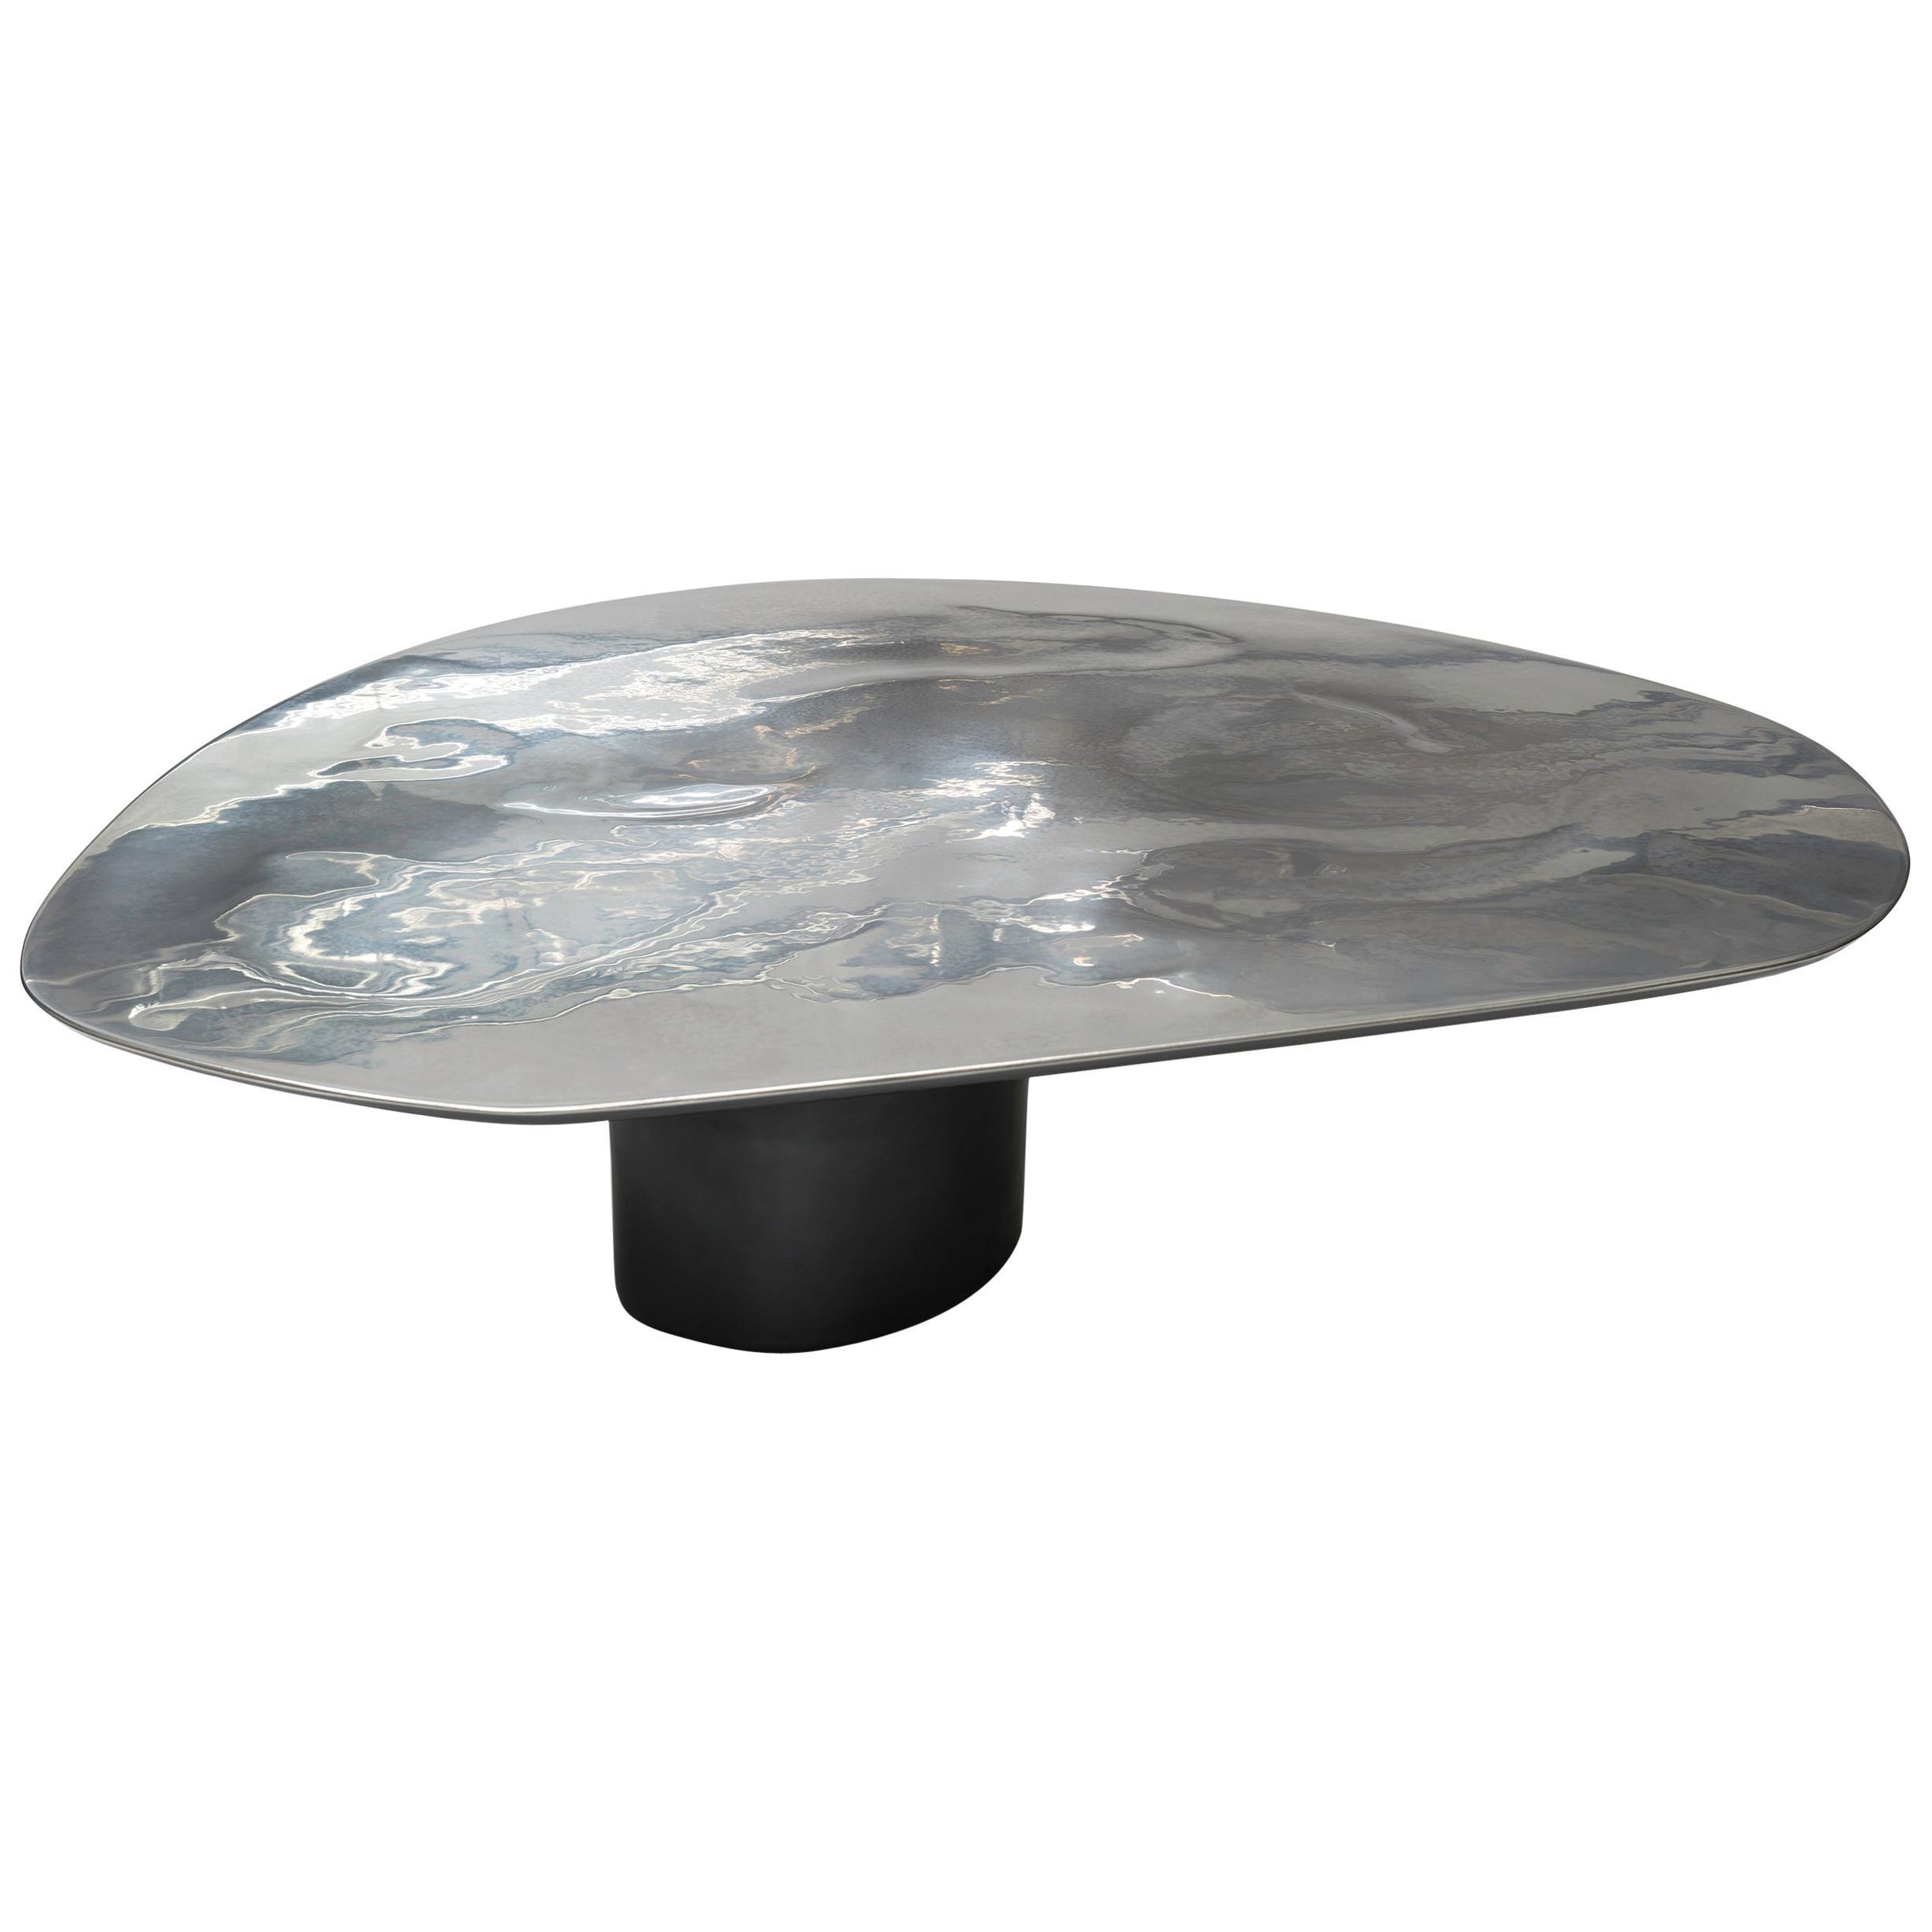 NR LOW, 21st Century Modern Sculptural Circular Silver Black Coffee Table